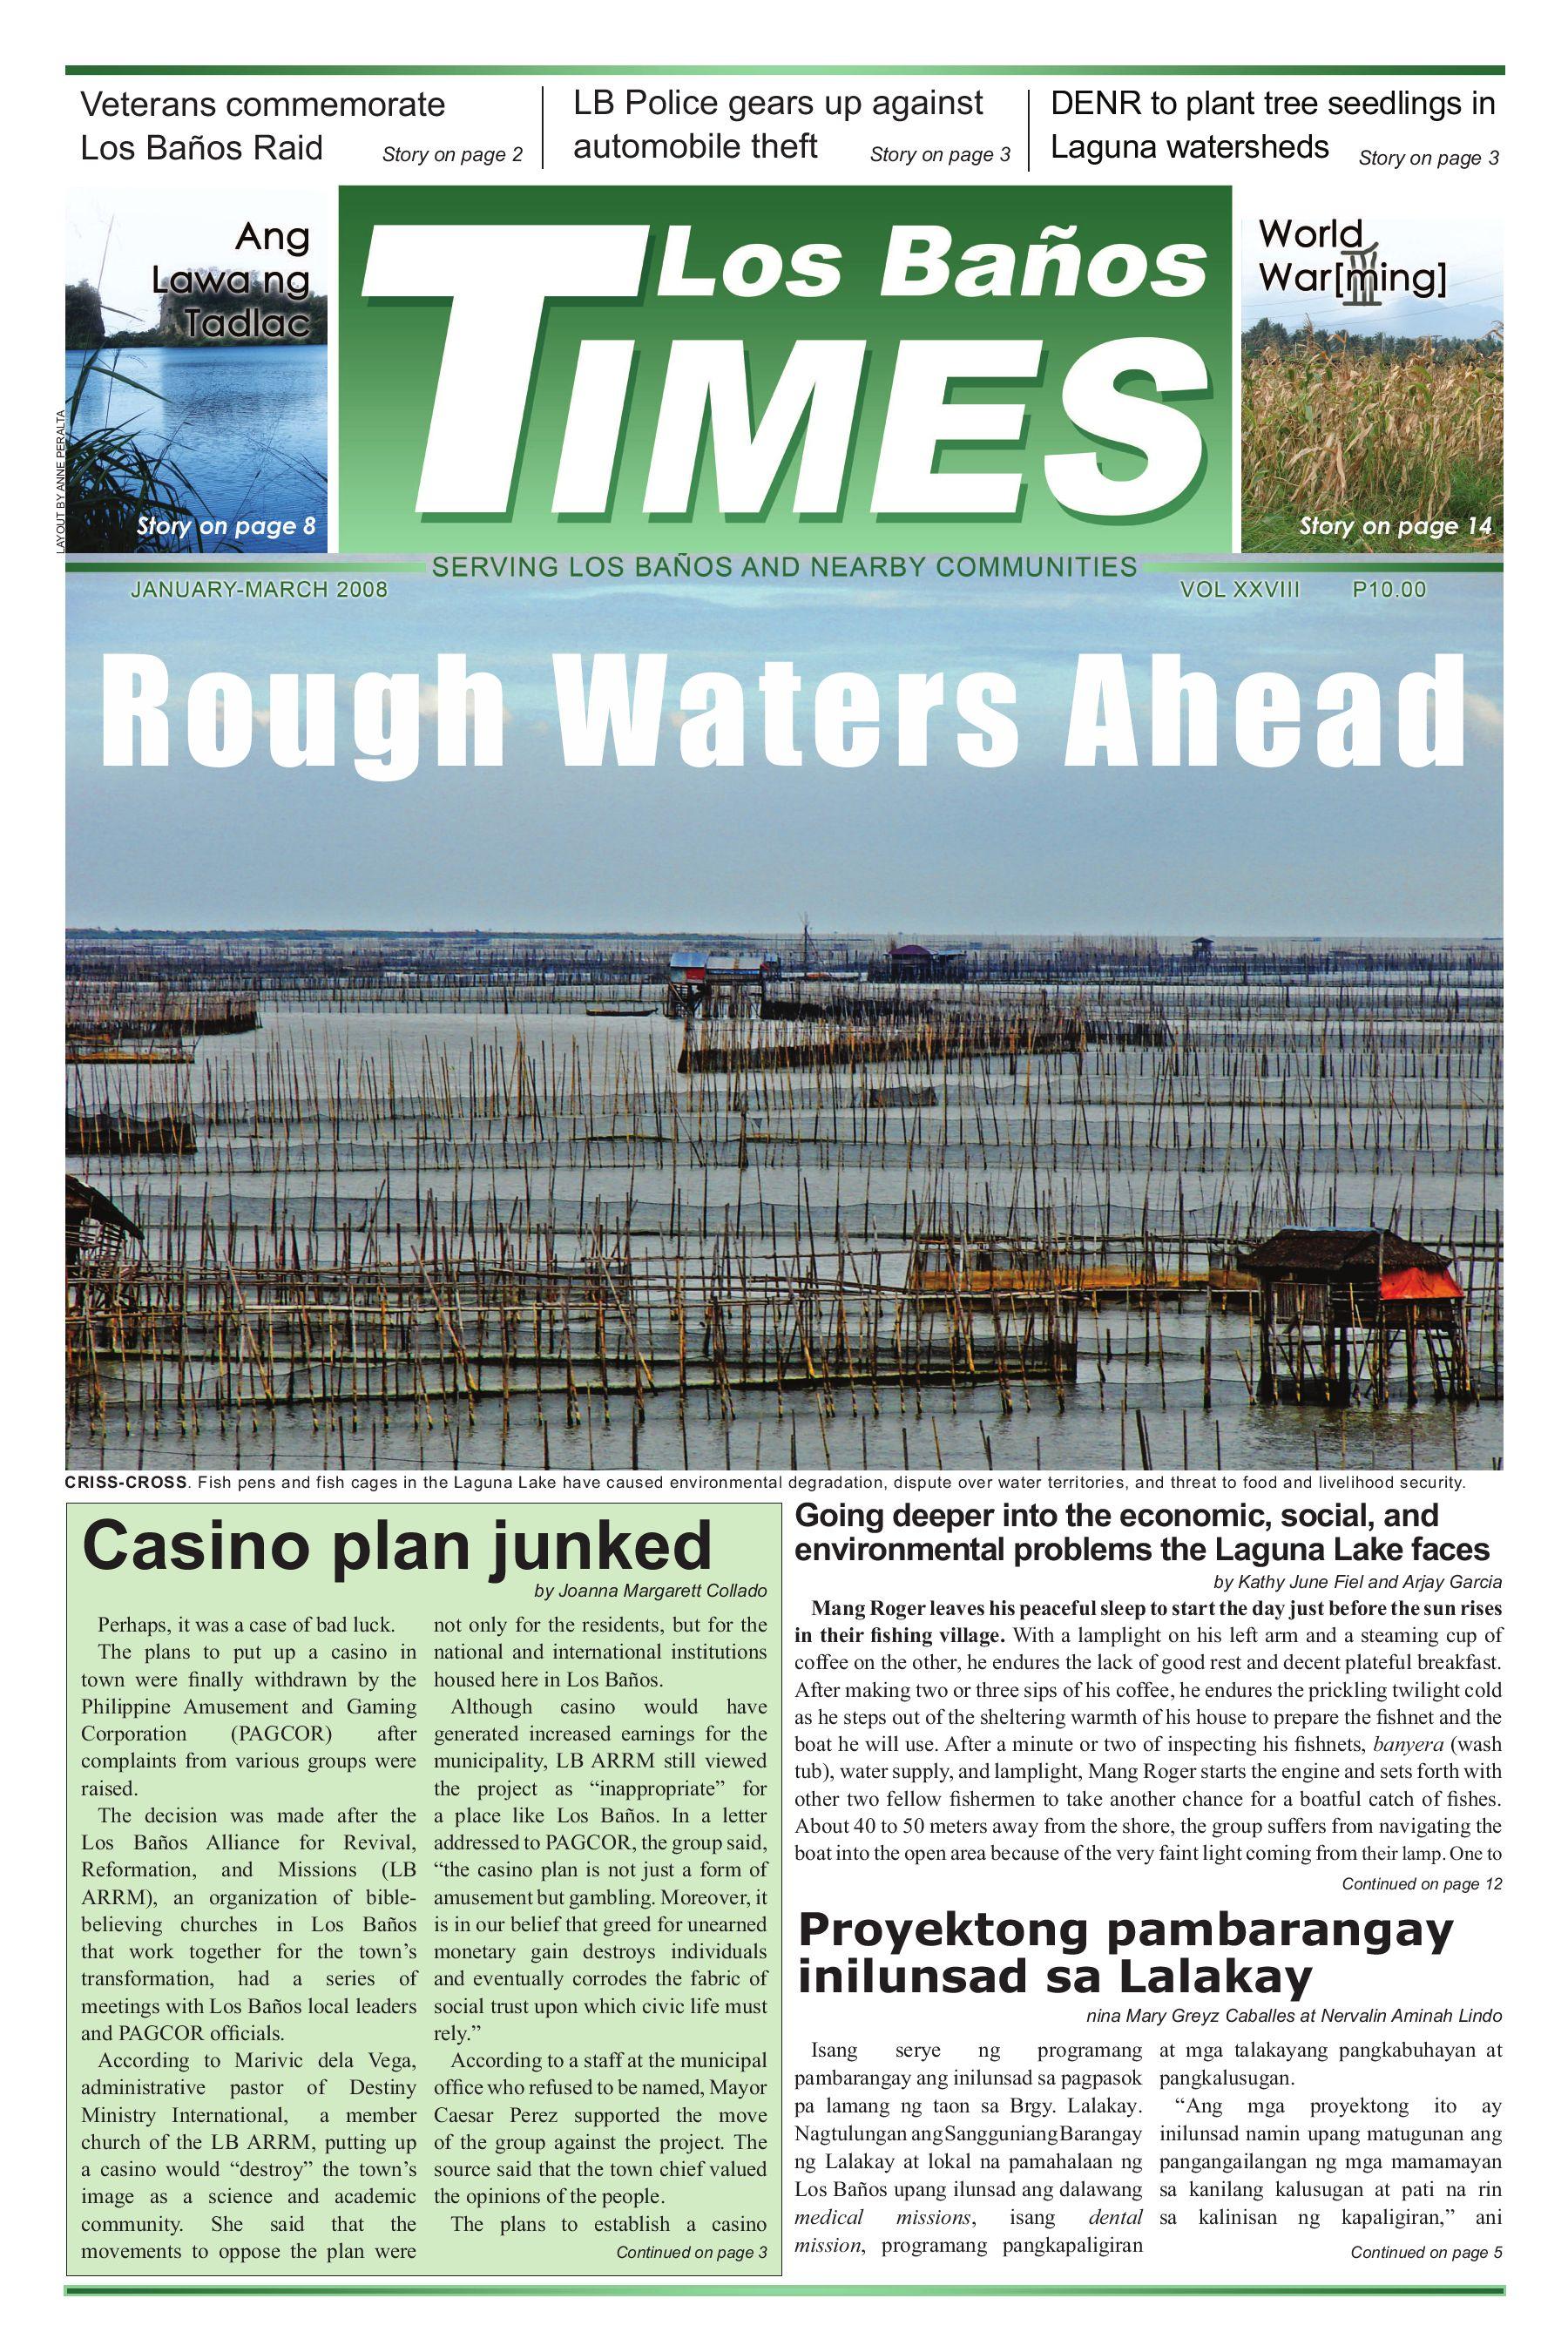 LB Times 28th Edition Broadsheet by lbtimes2008 - issuu